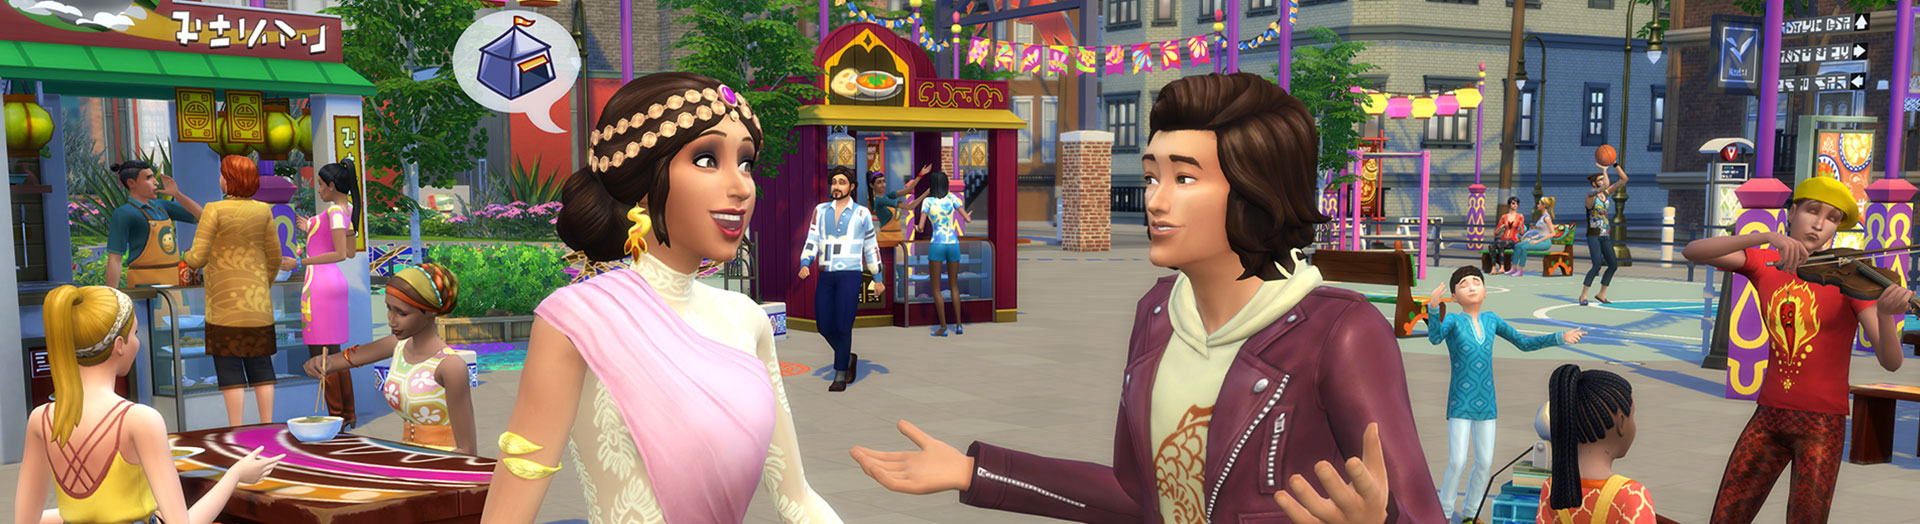 Les Sims 4 Vie Citadine [3 Novembre 2016] 207376TS4EP3Screen1web1